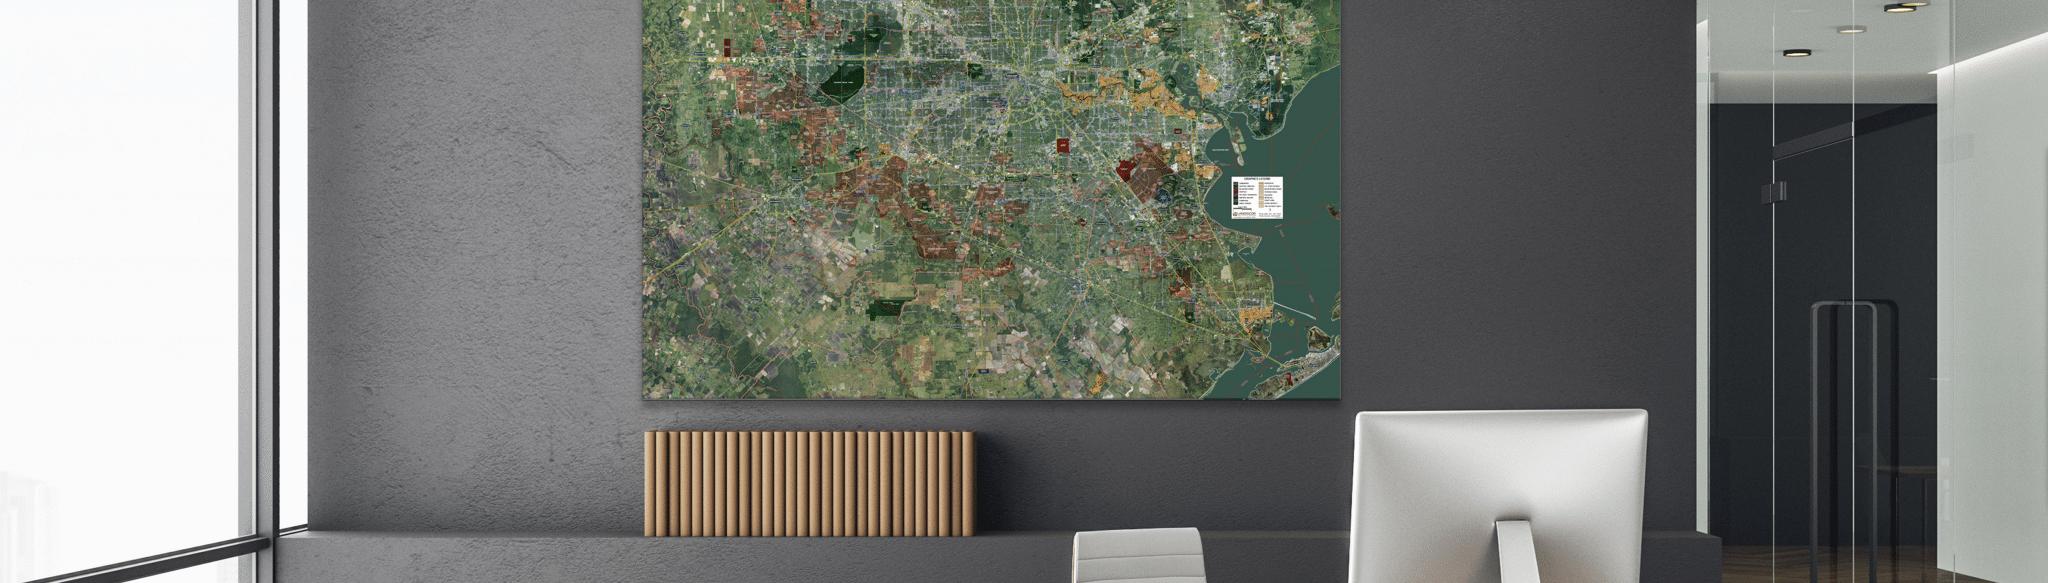 2021-Houston-Aerial-Wall-Mural